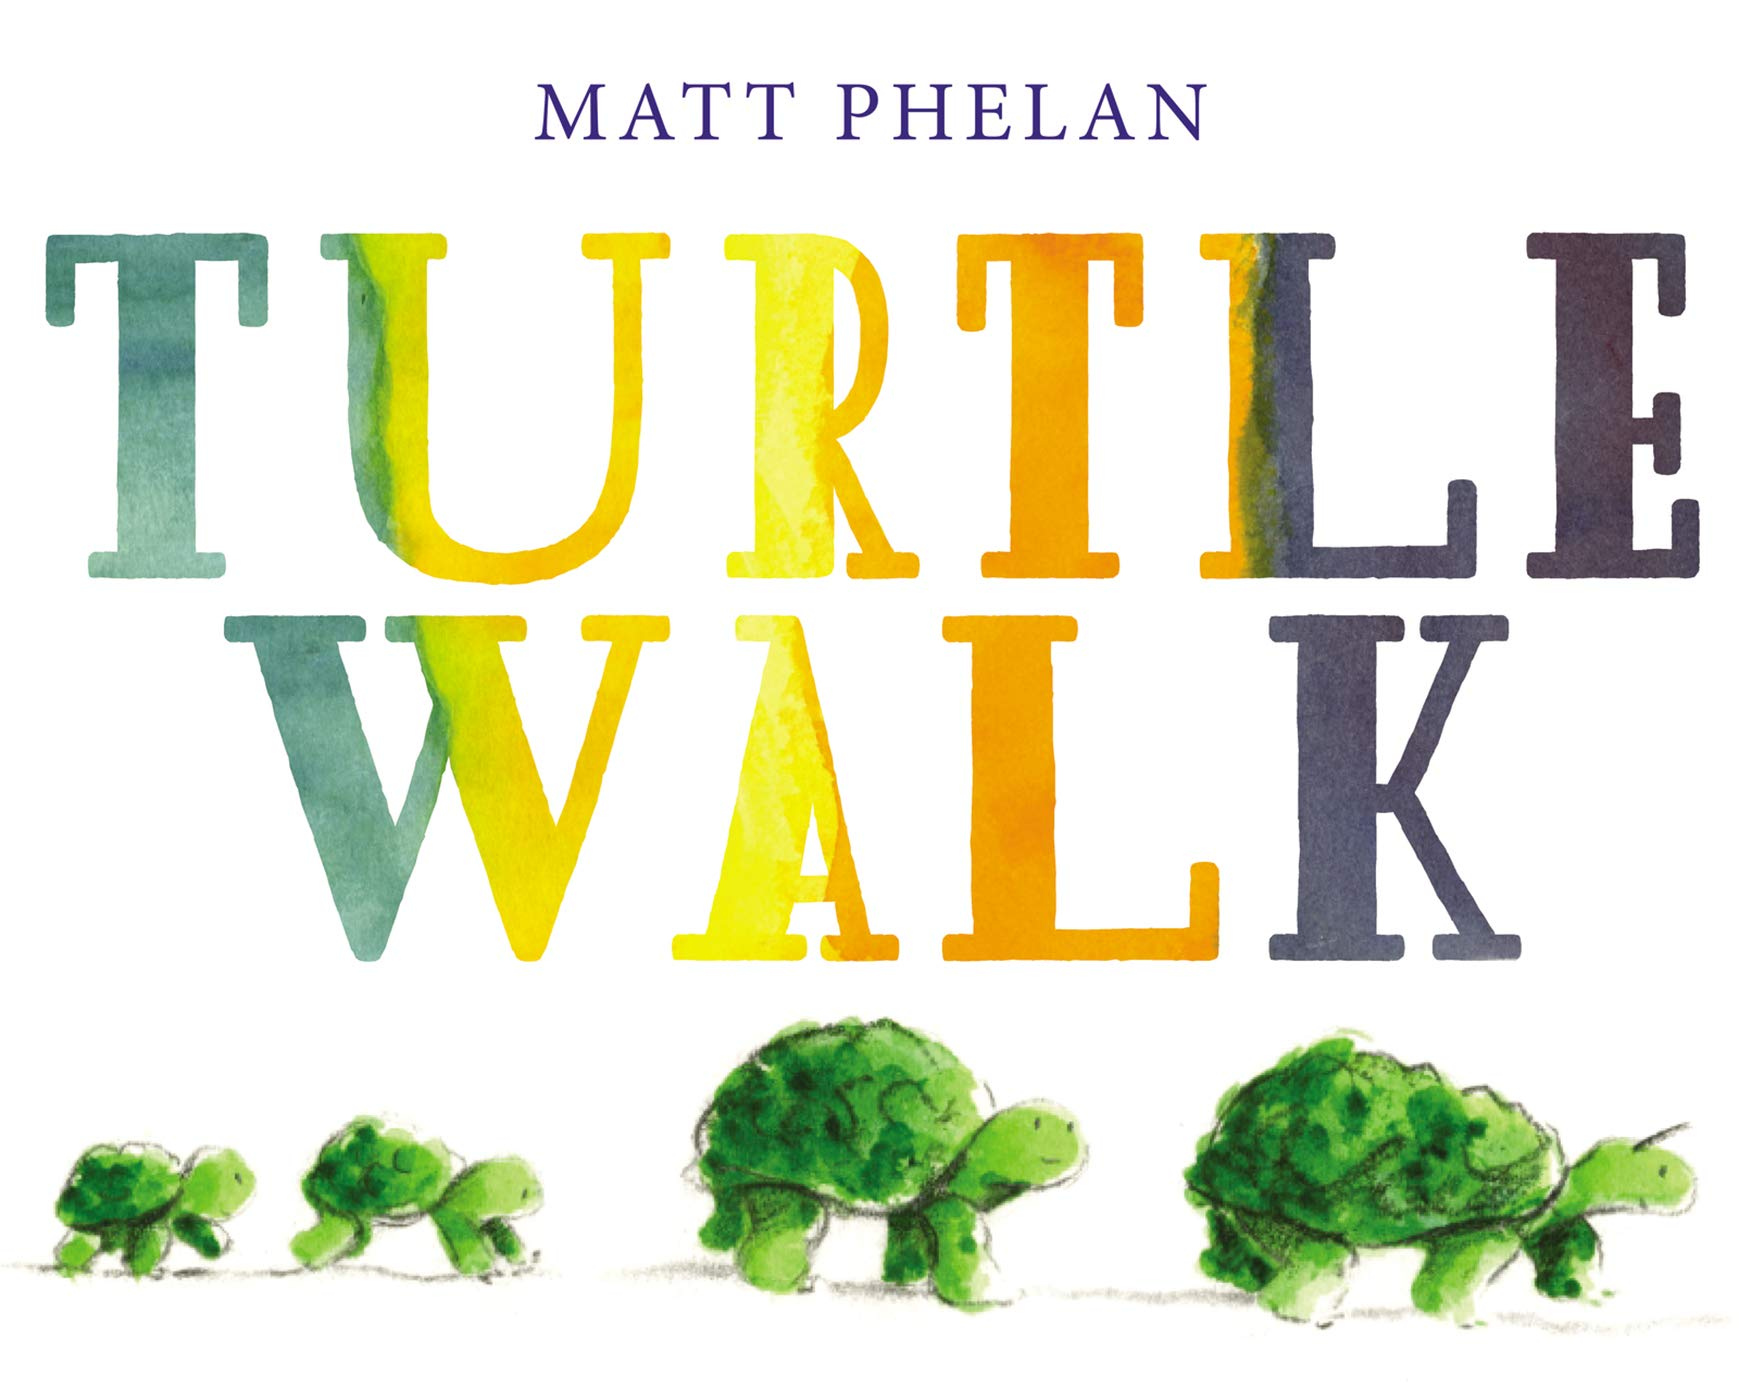 Turtle Walk: Phelan, Matt, Phelan, Matt: 9780062934130: Amazon.com: Books